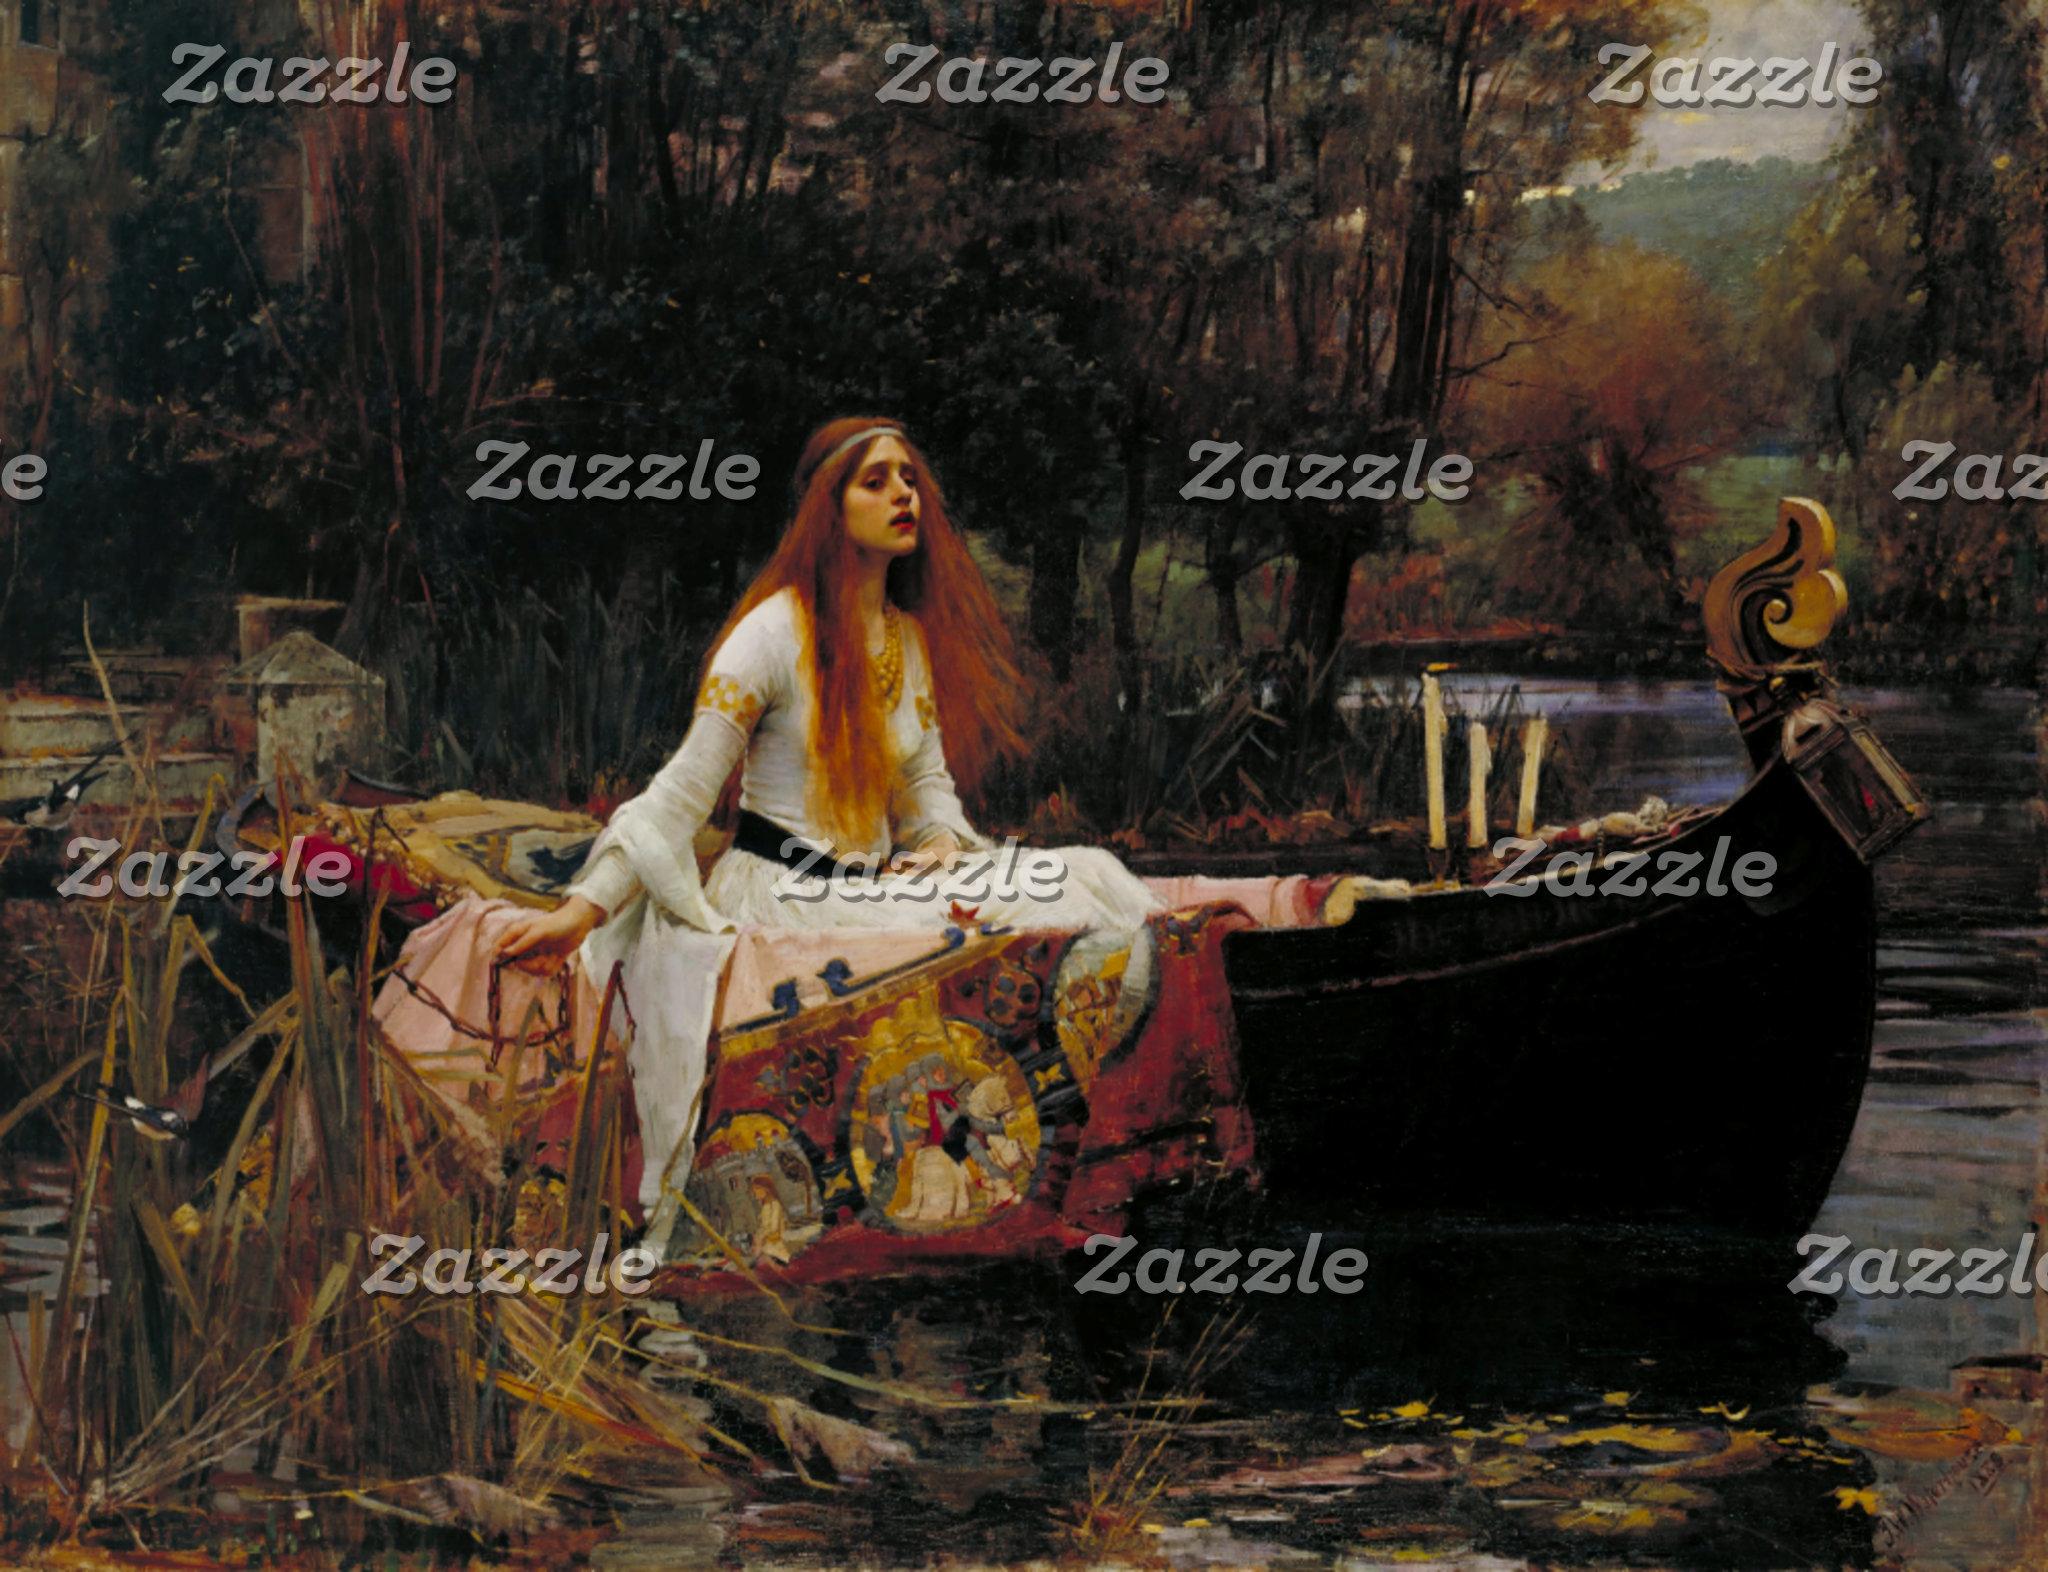 19th Century/Victorian Era